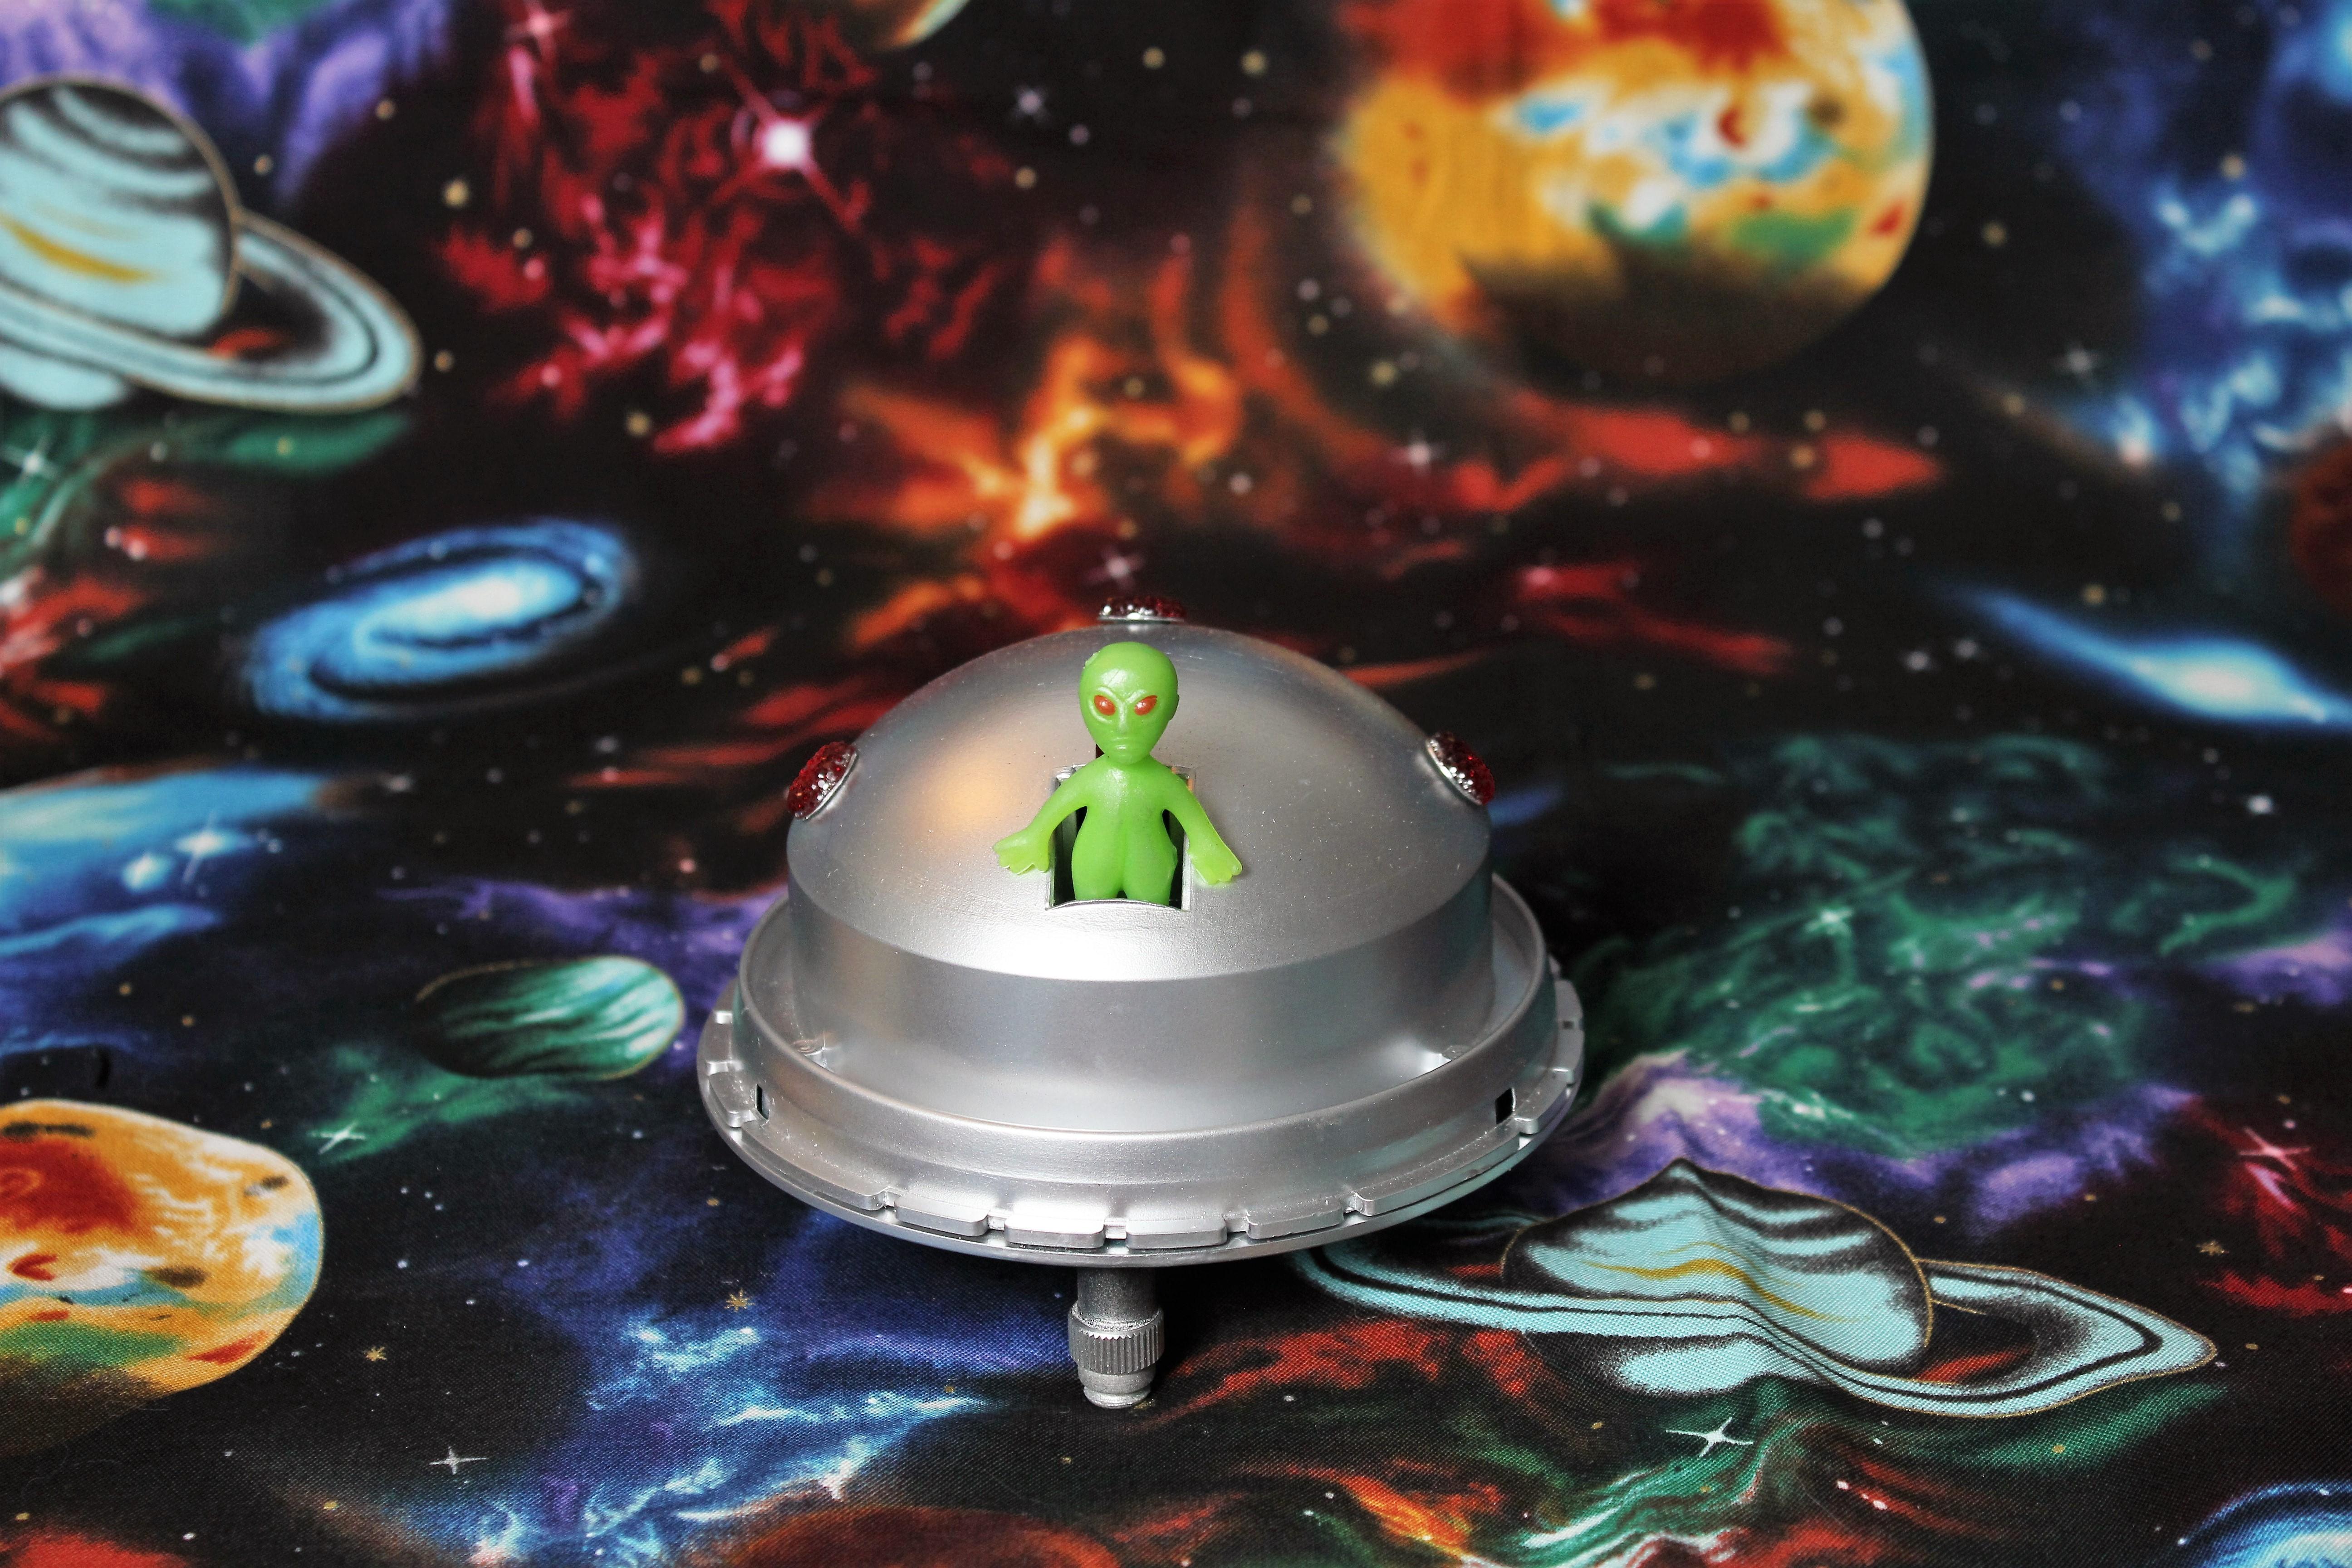 132 Space Probe